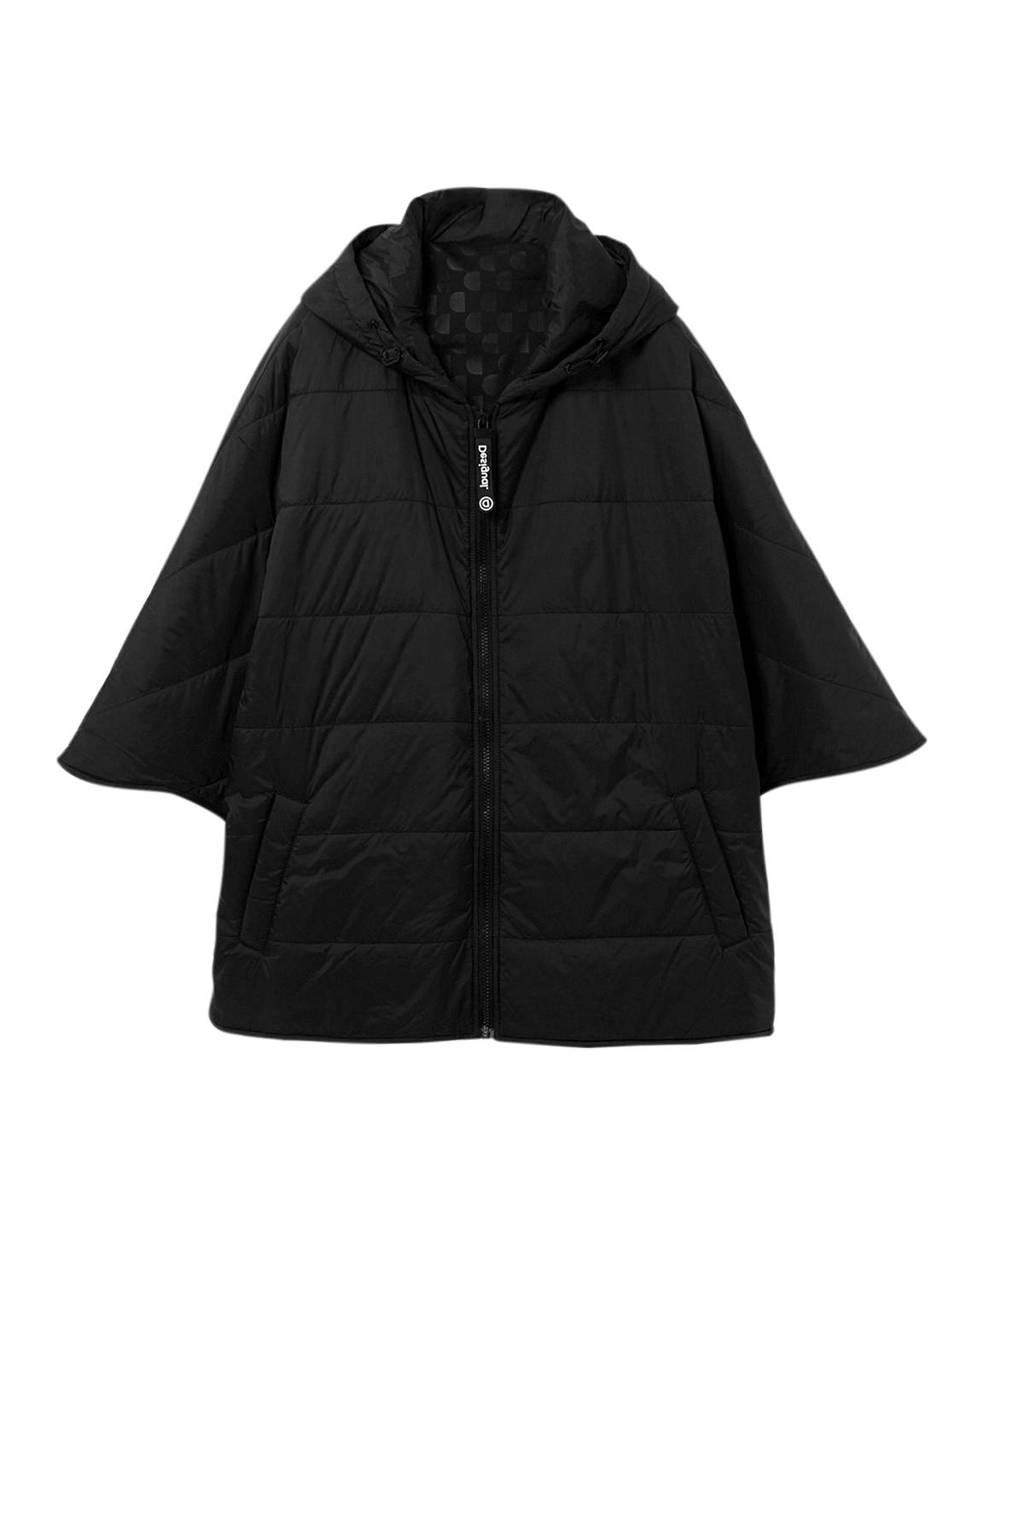 Desigual gewatteerde poncho zwart, Zwart